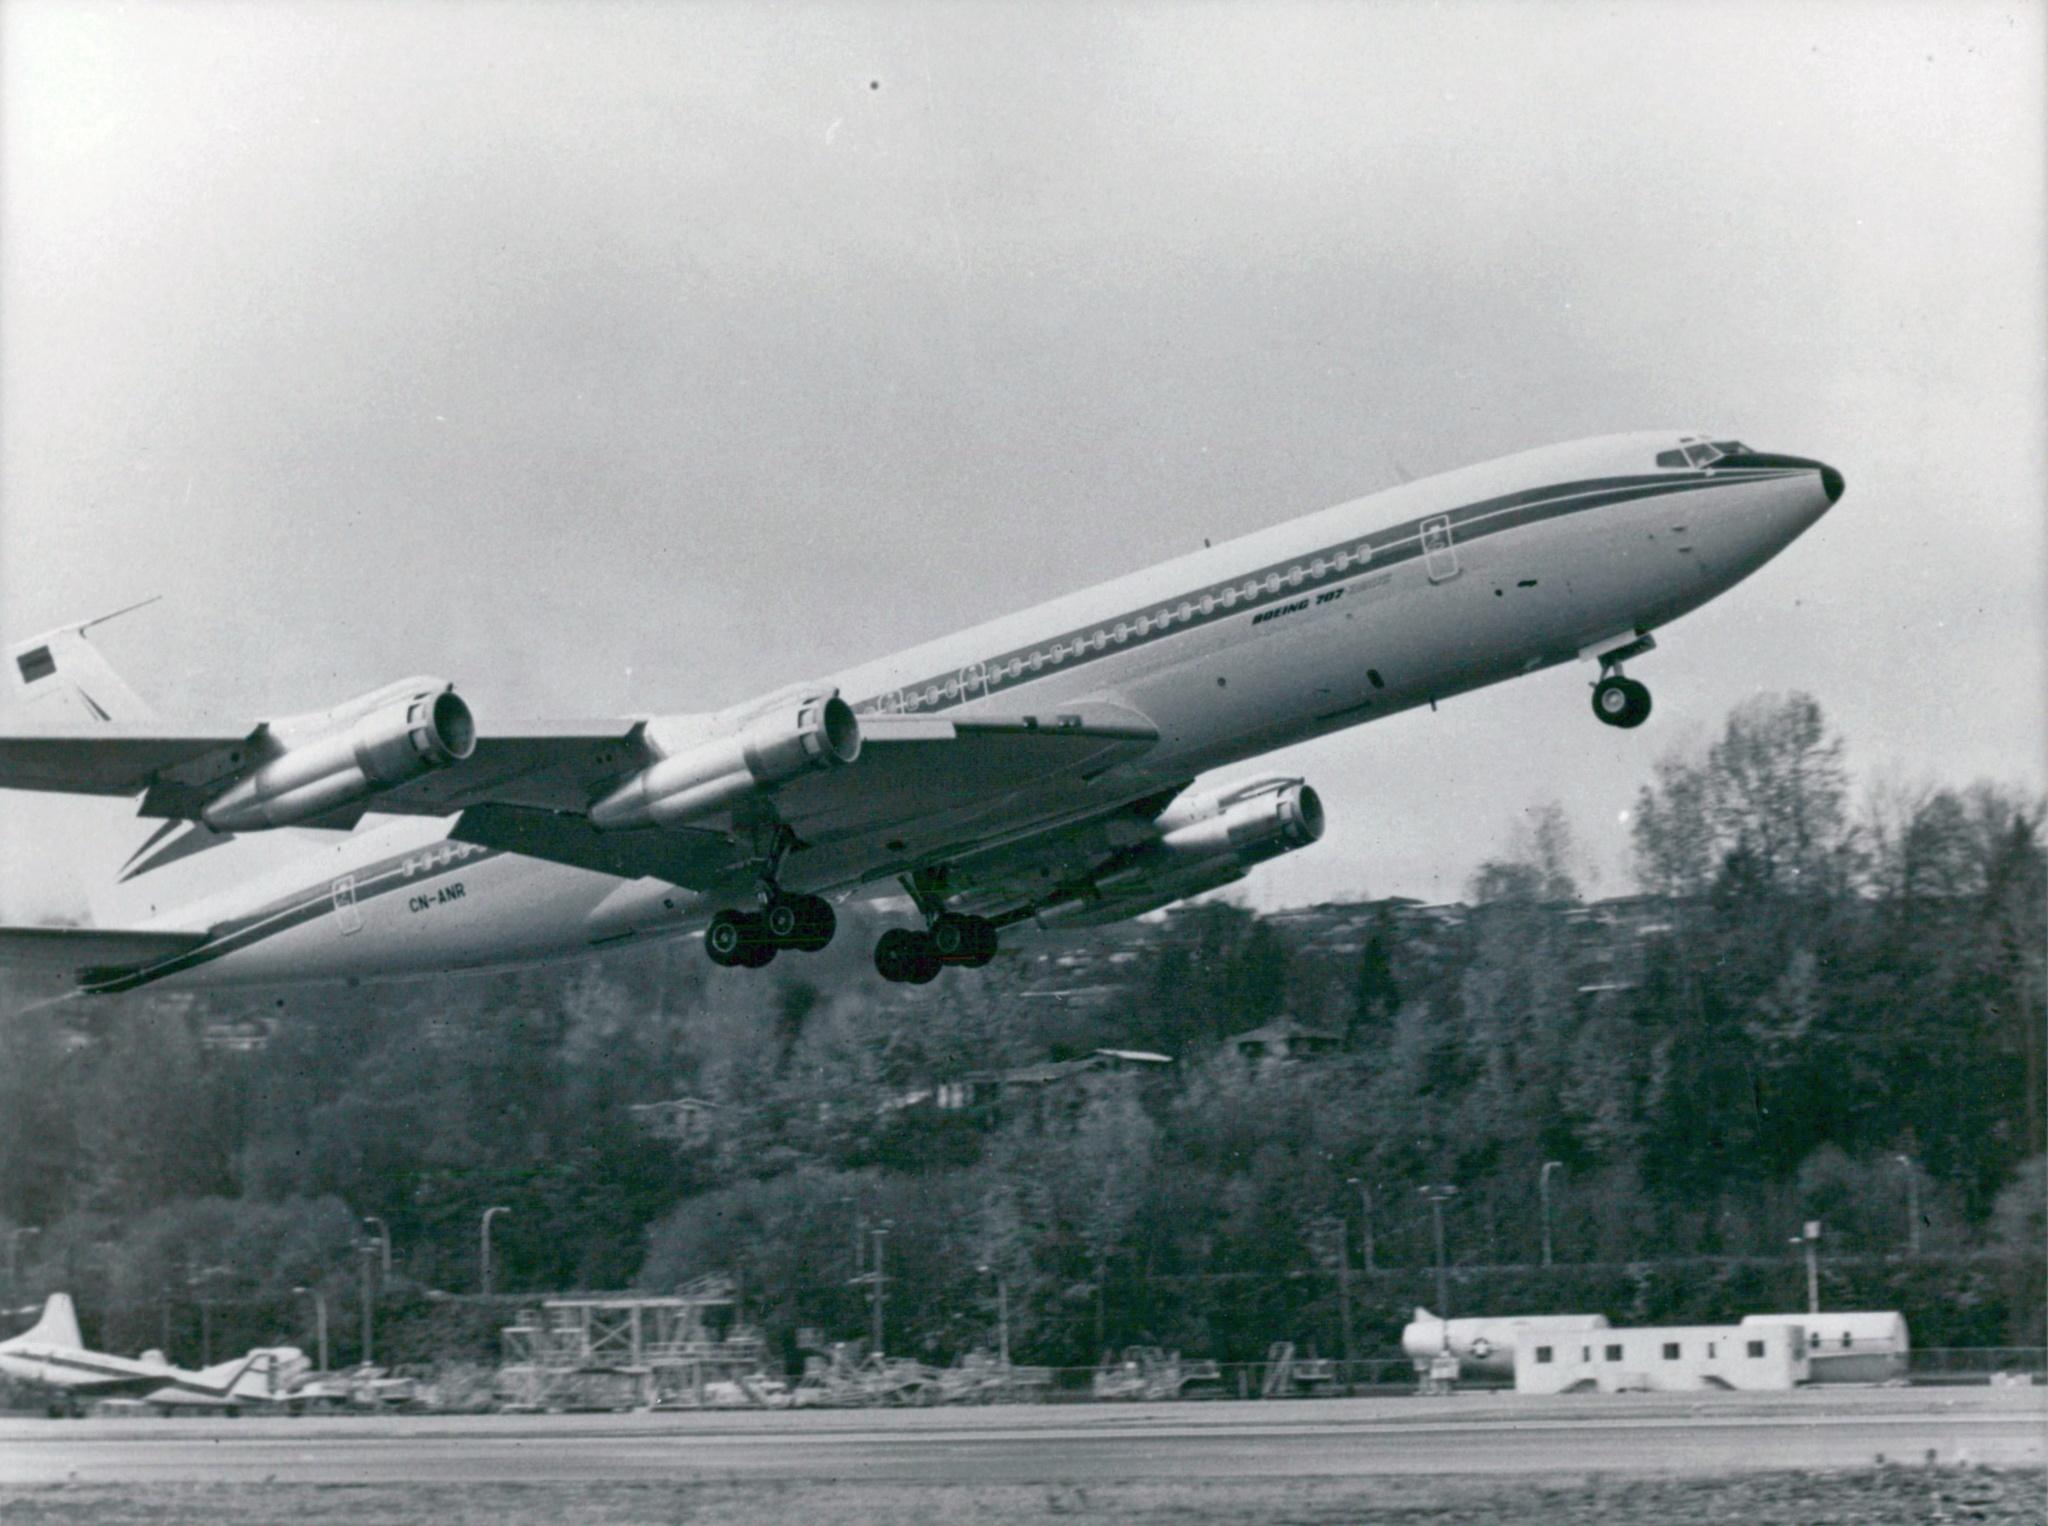 FRA: Photos anciens avions des FRA - Page 13 Clipb146